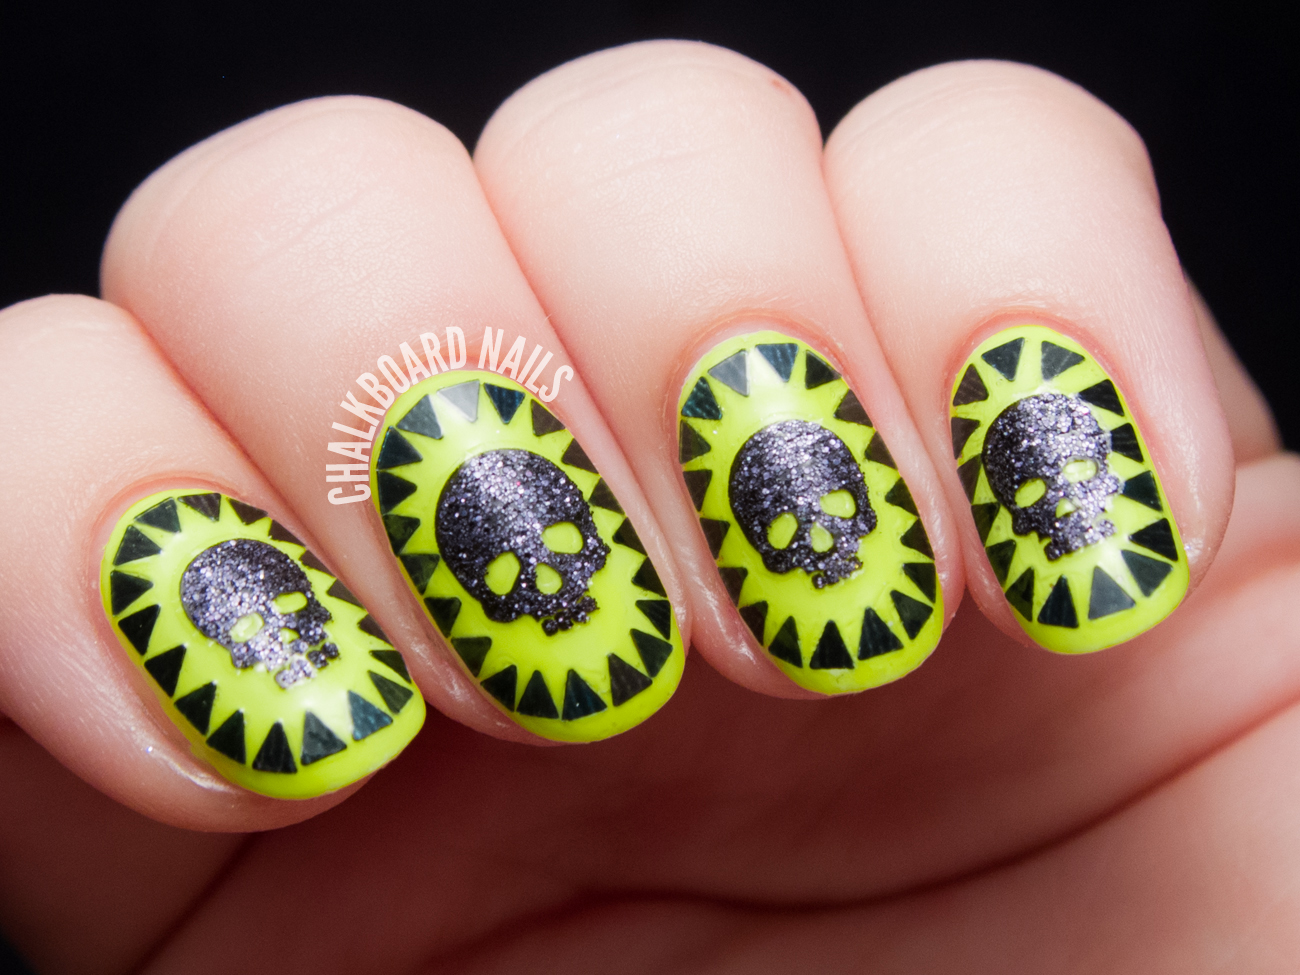 Glittery Skull Cameos by @chalkboardnails